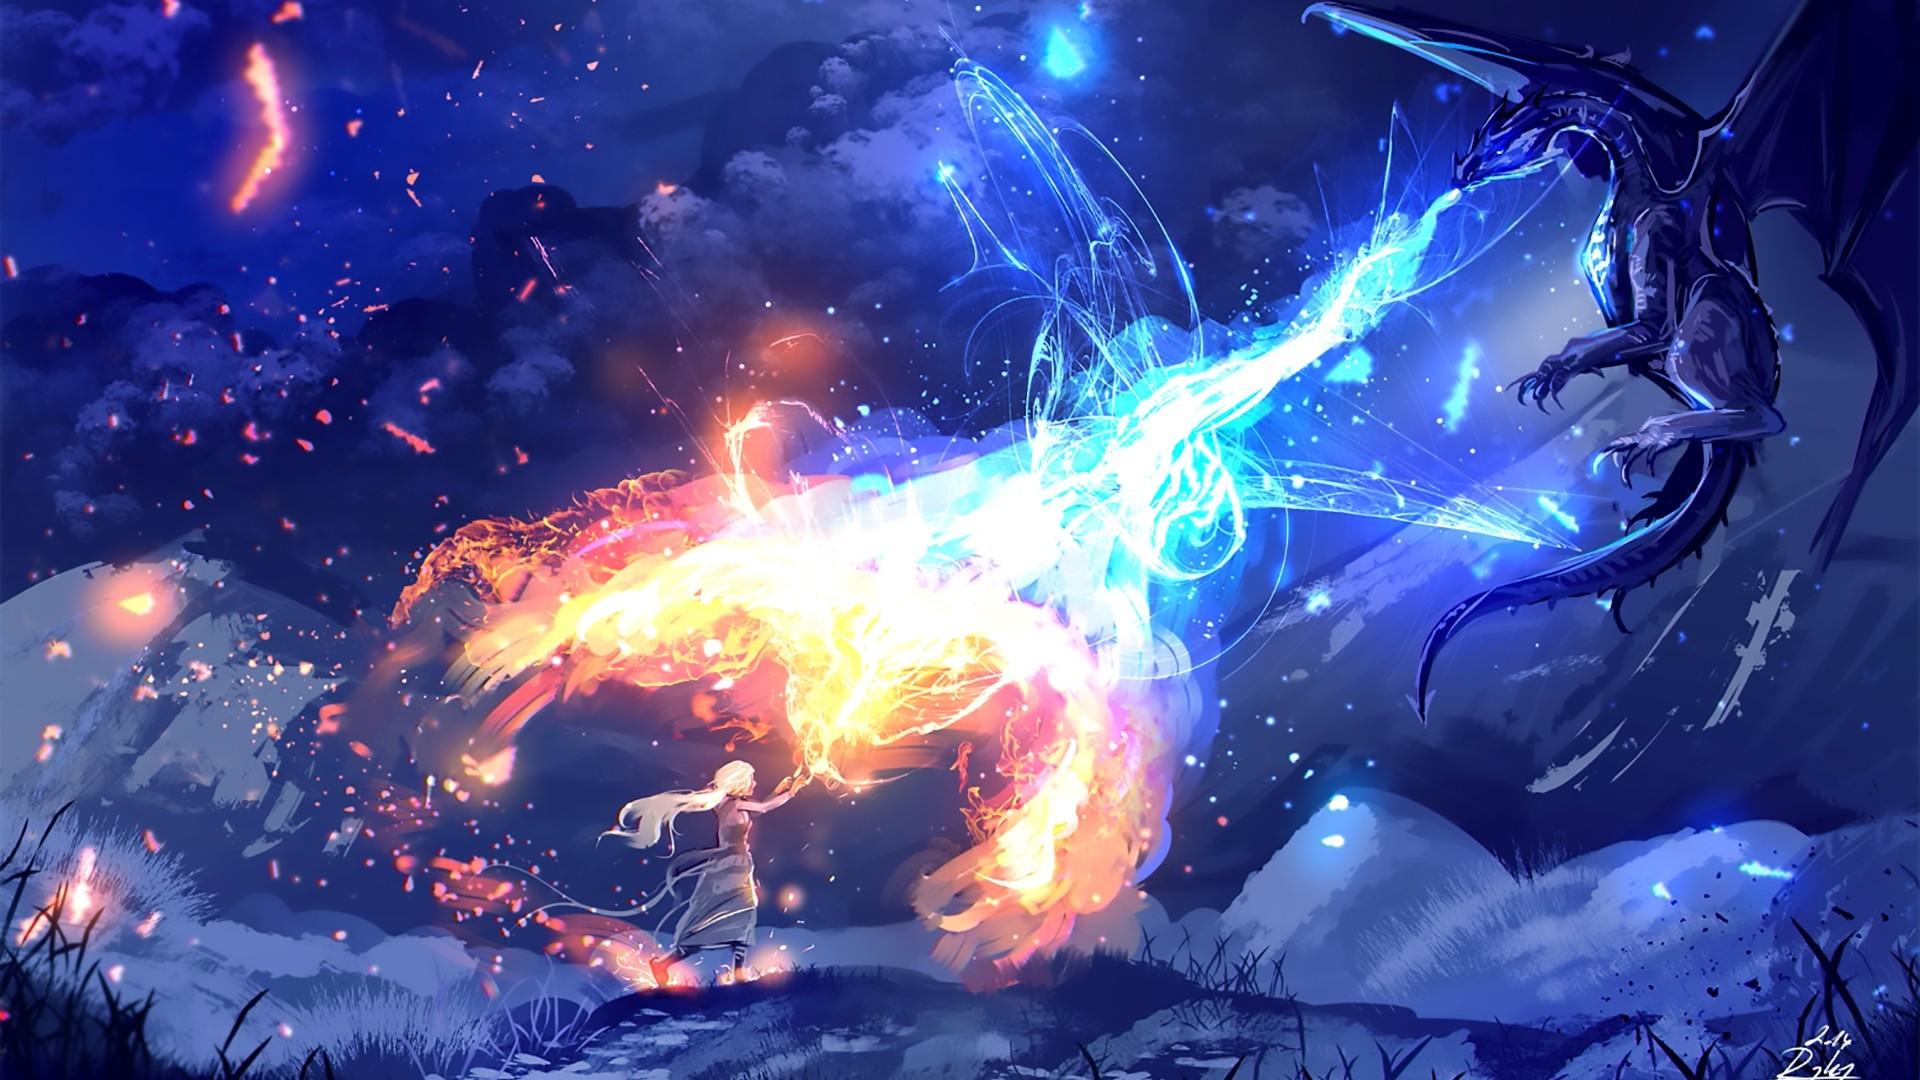 Fire And Ice Desktop Wallpaper